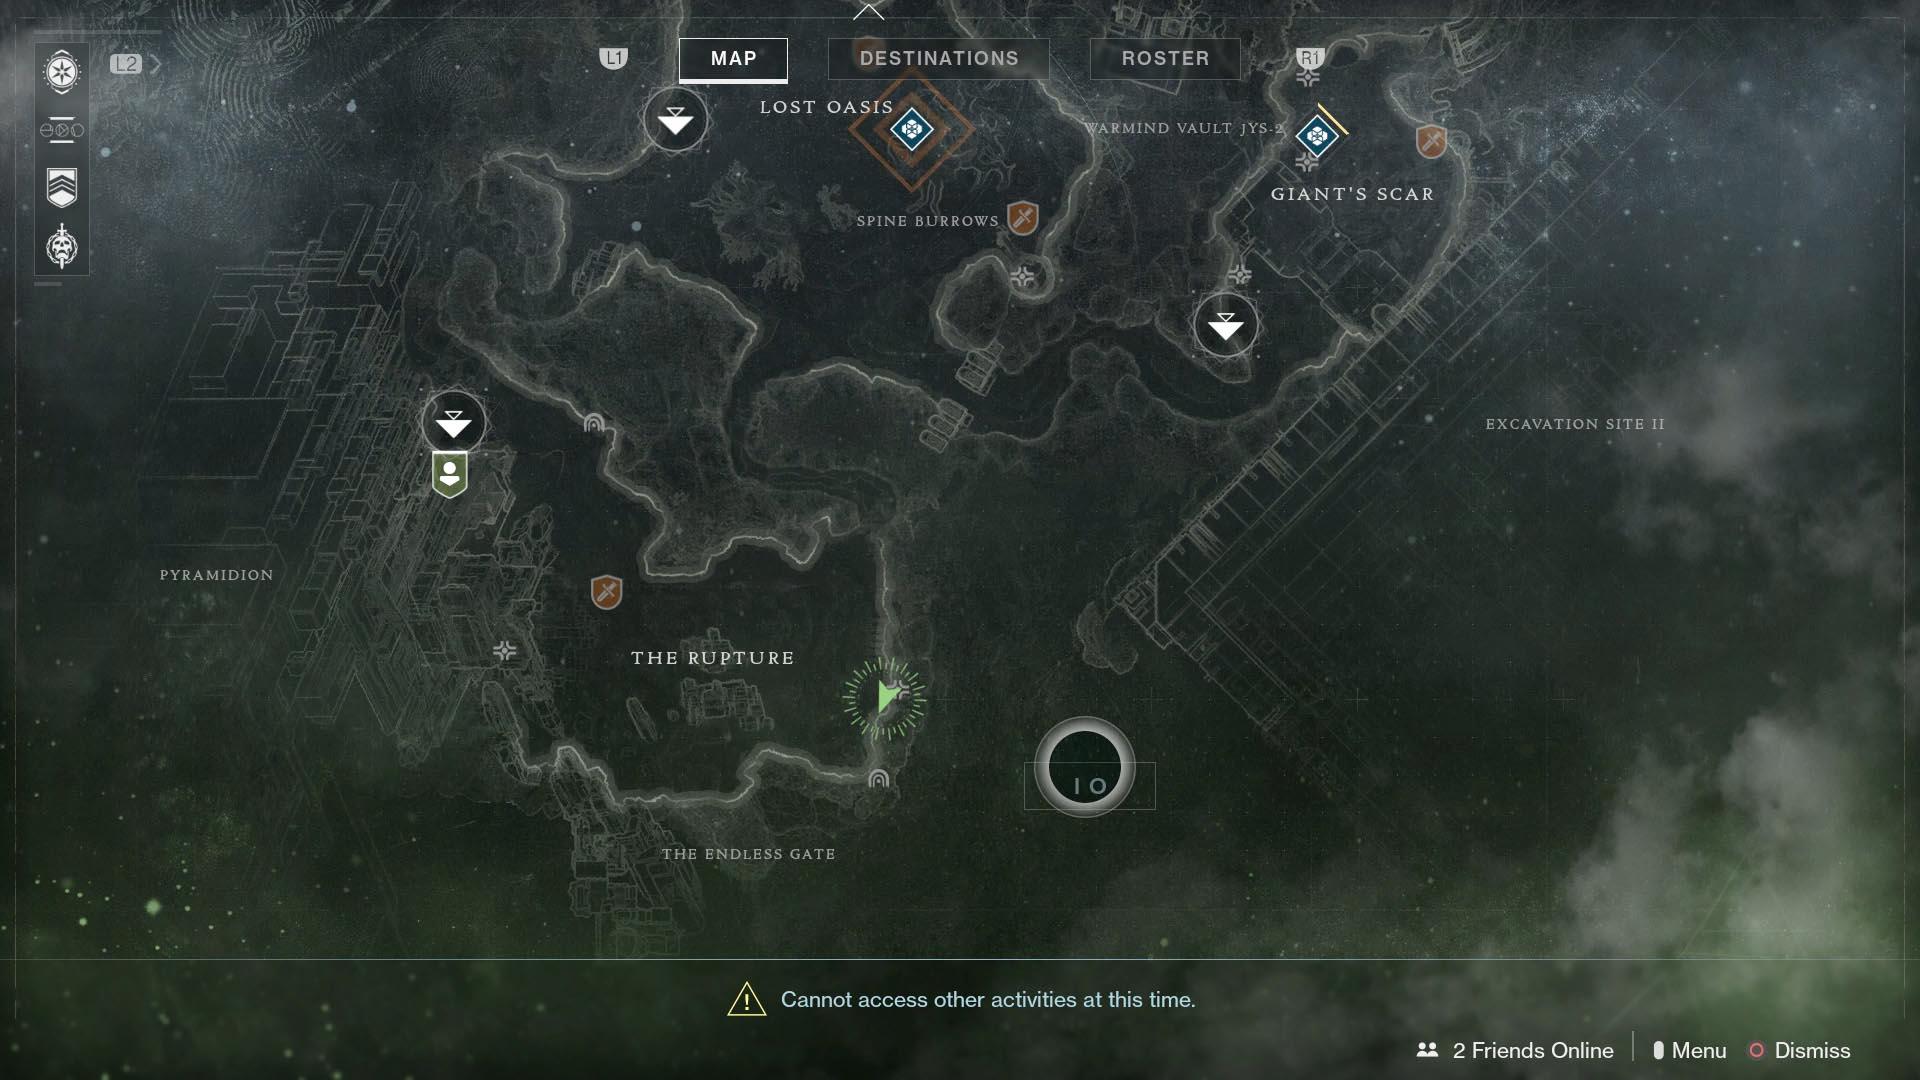 Destiny 2 guide: Arecibo Io Adventure walkthrough - Polygon on